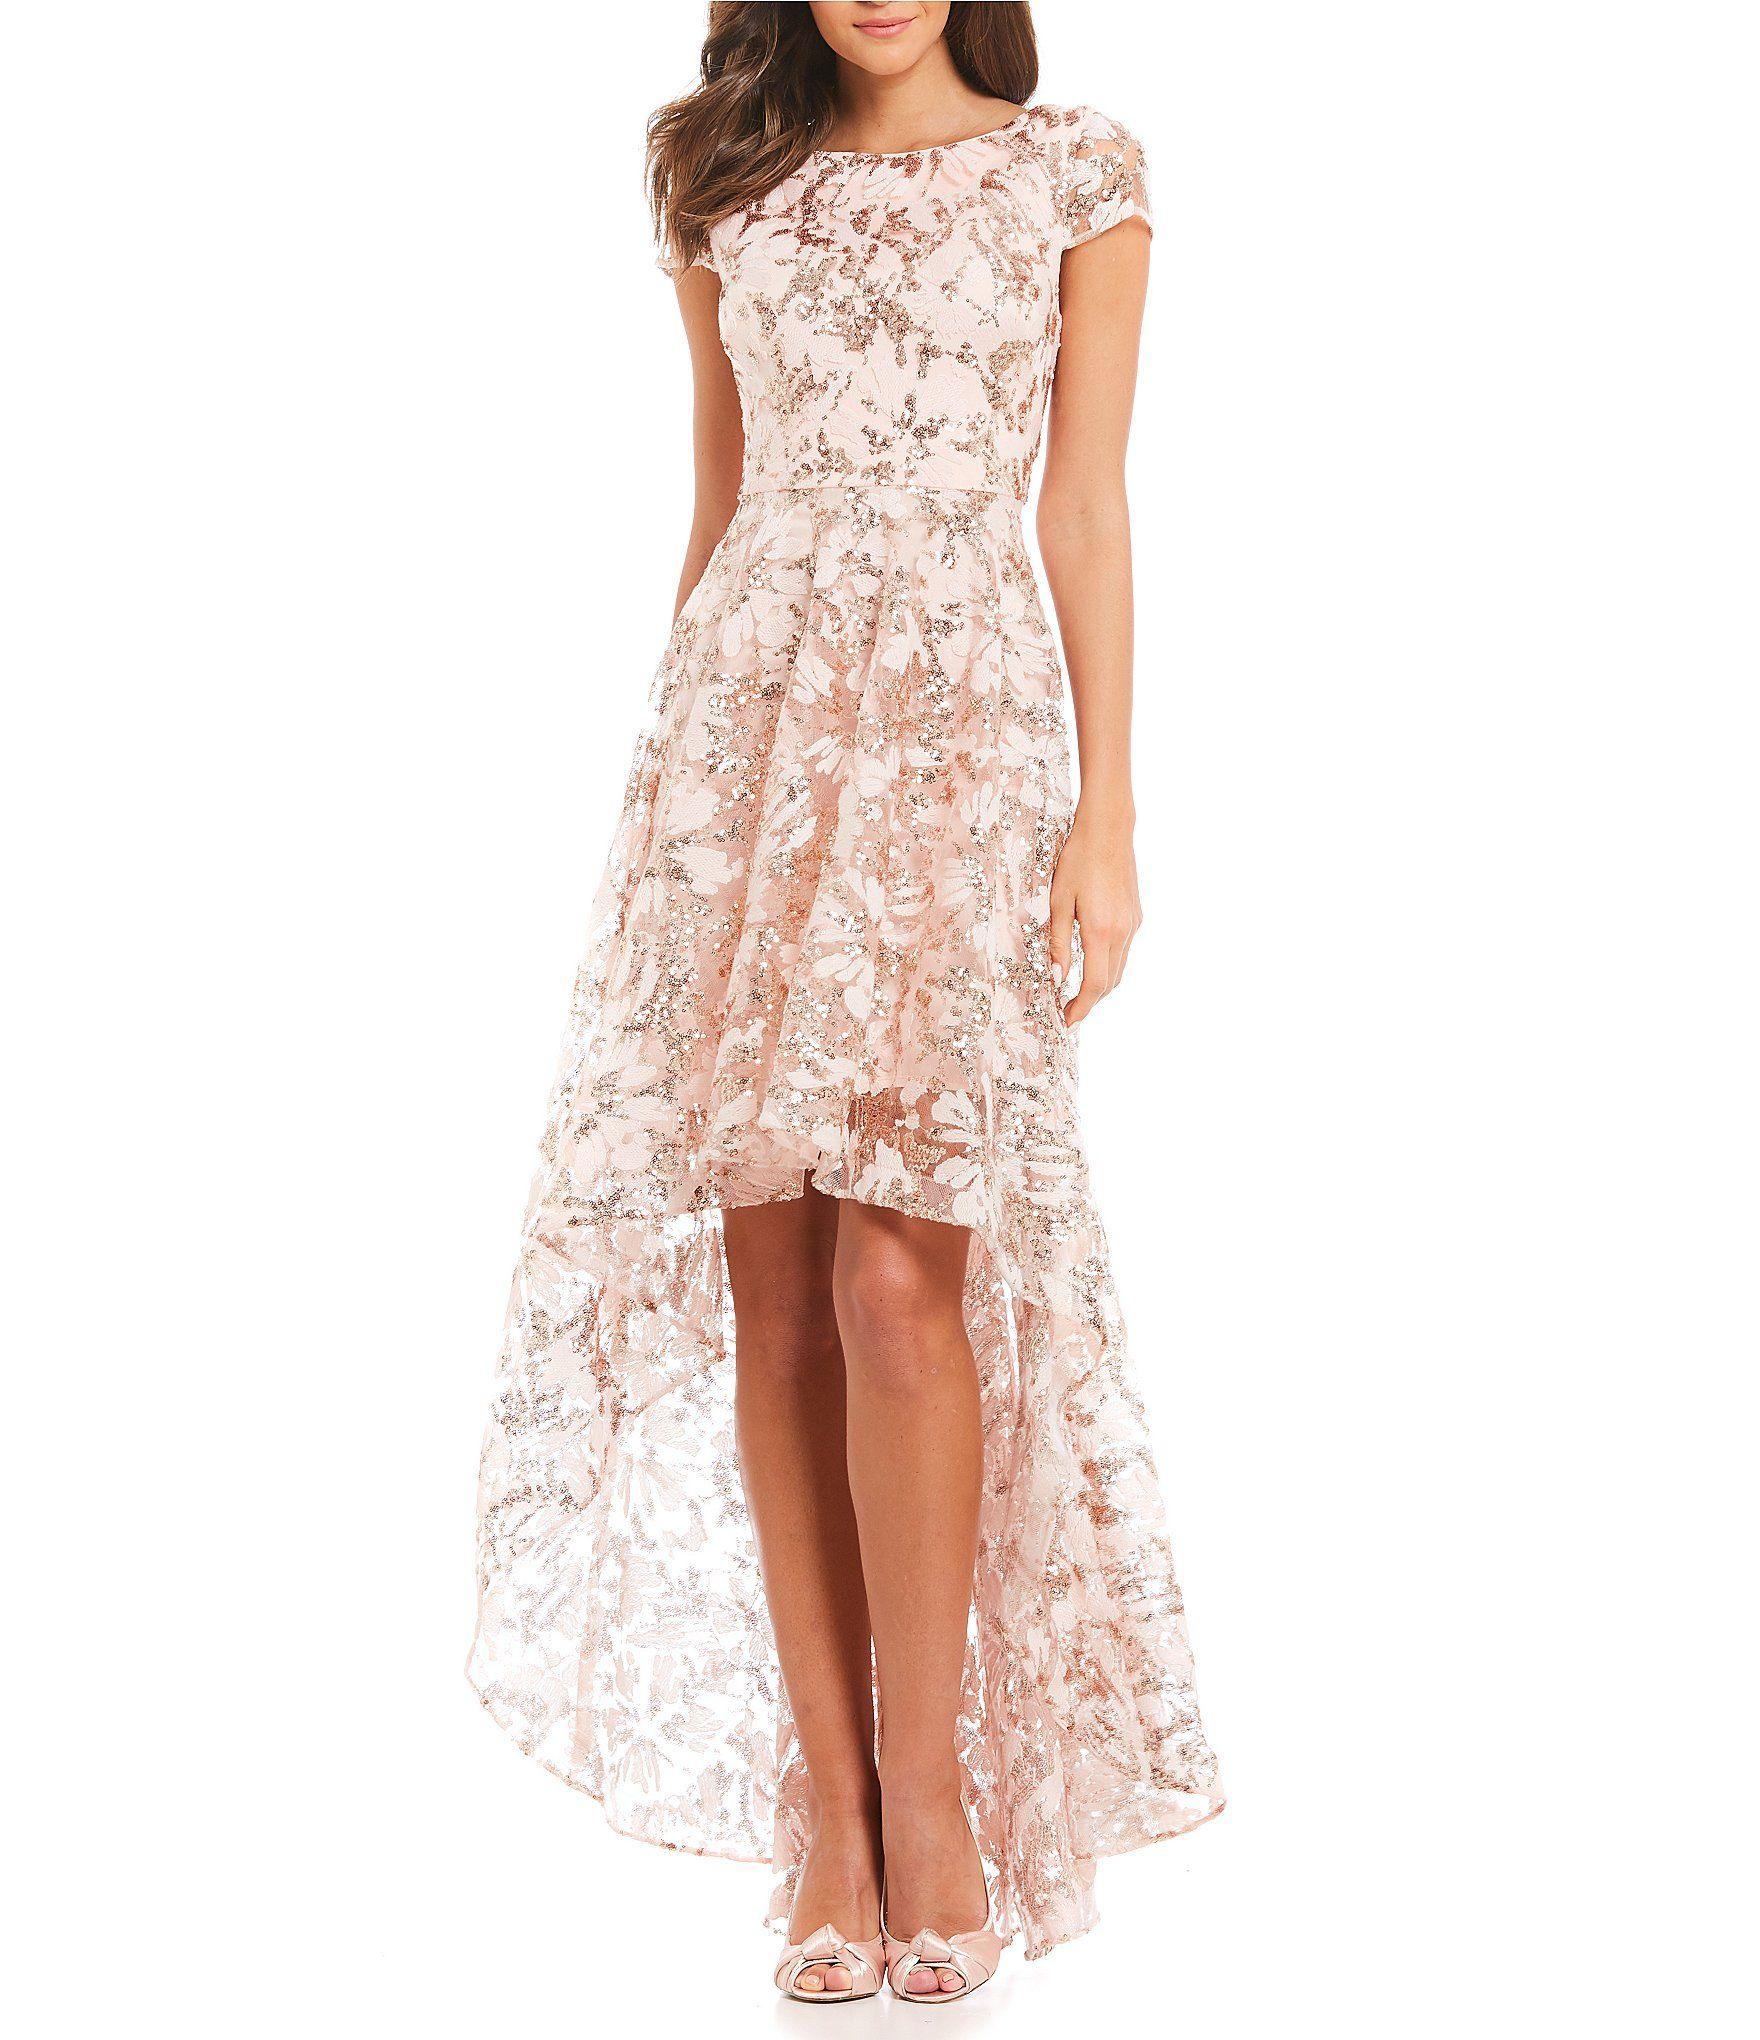 12a59dbafbd Shop for Eliza J Hi-Lo Sequin Gown at Dillards.com. Visit Dillards.com to  find clothing